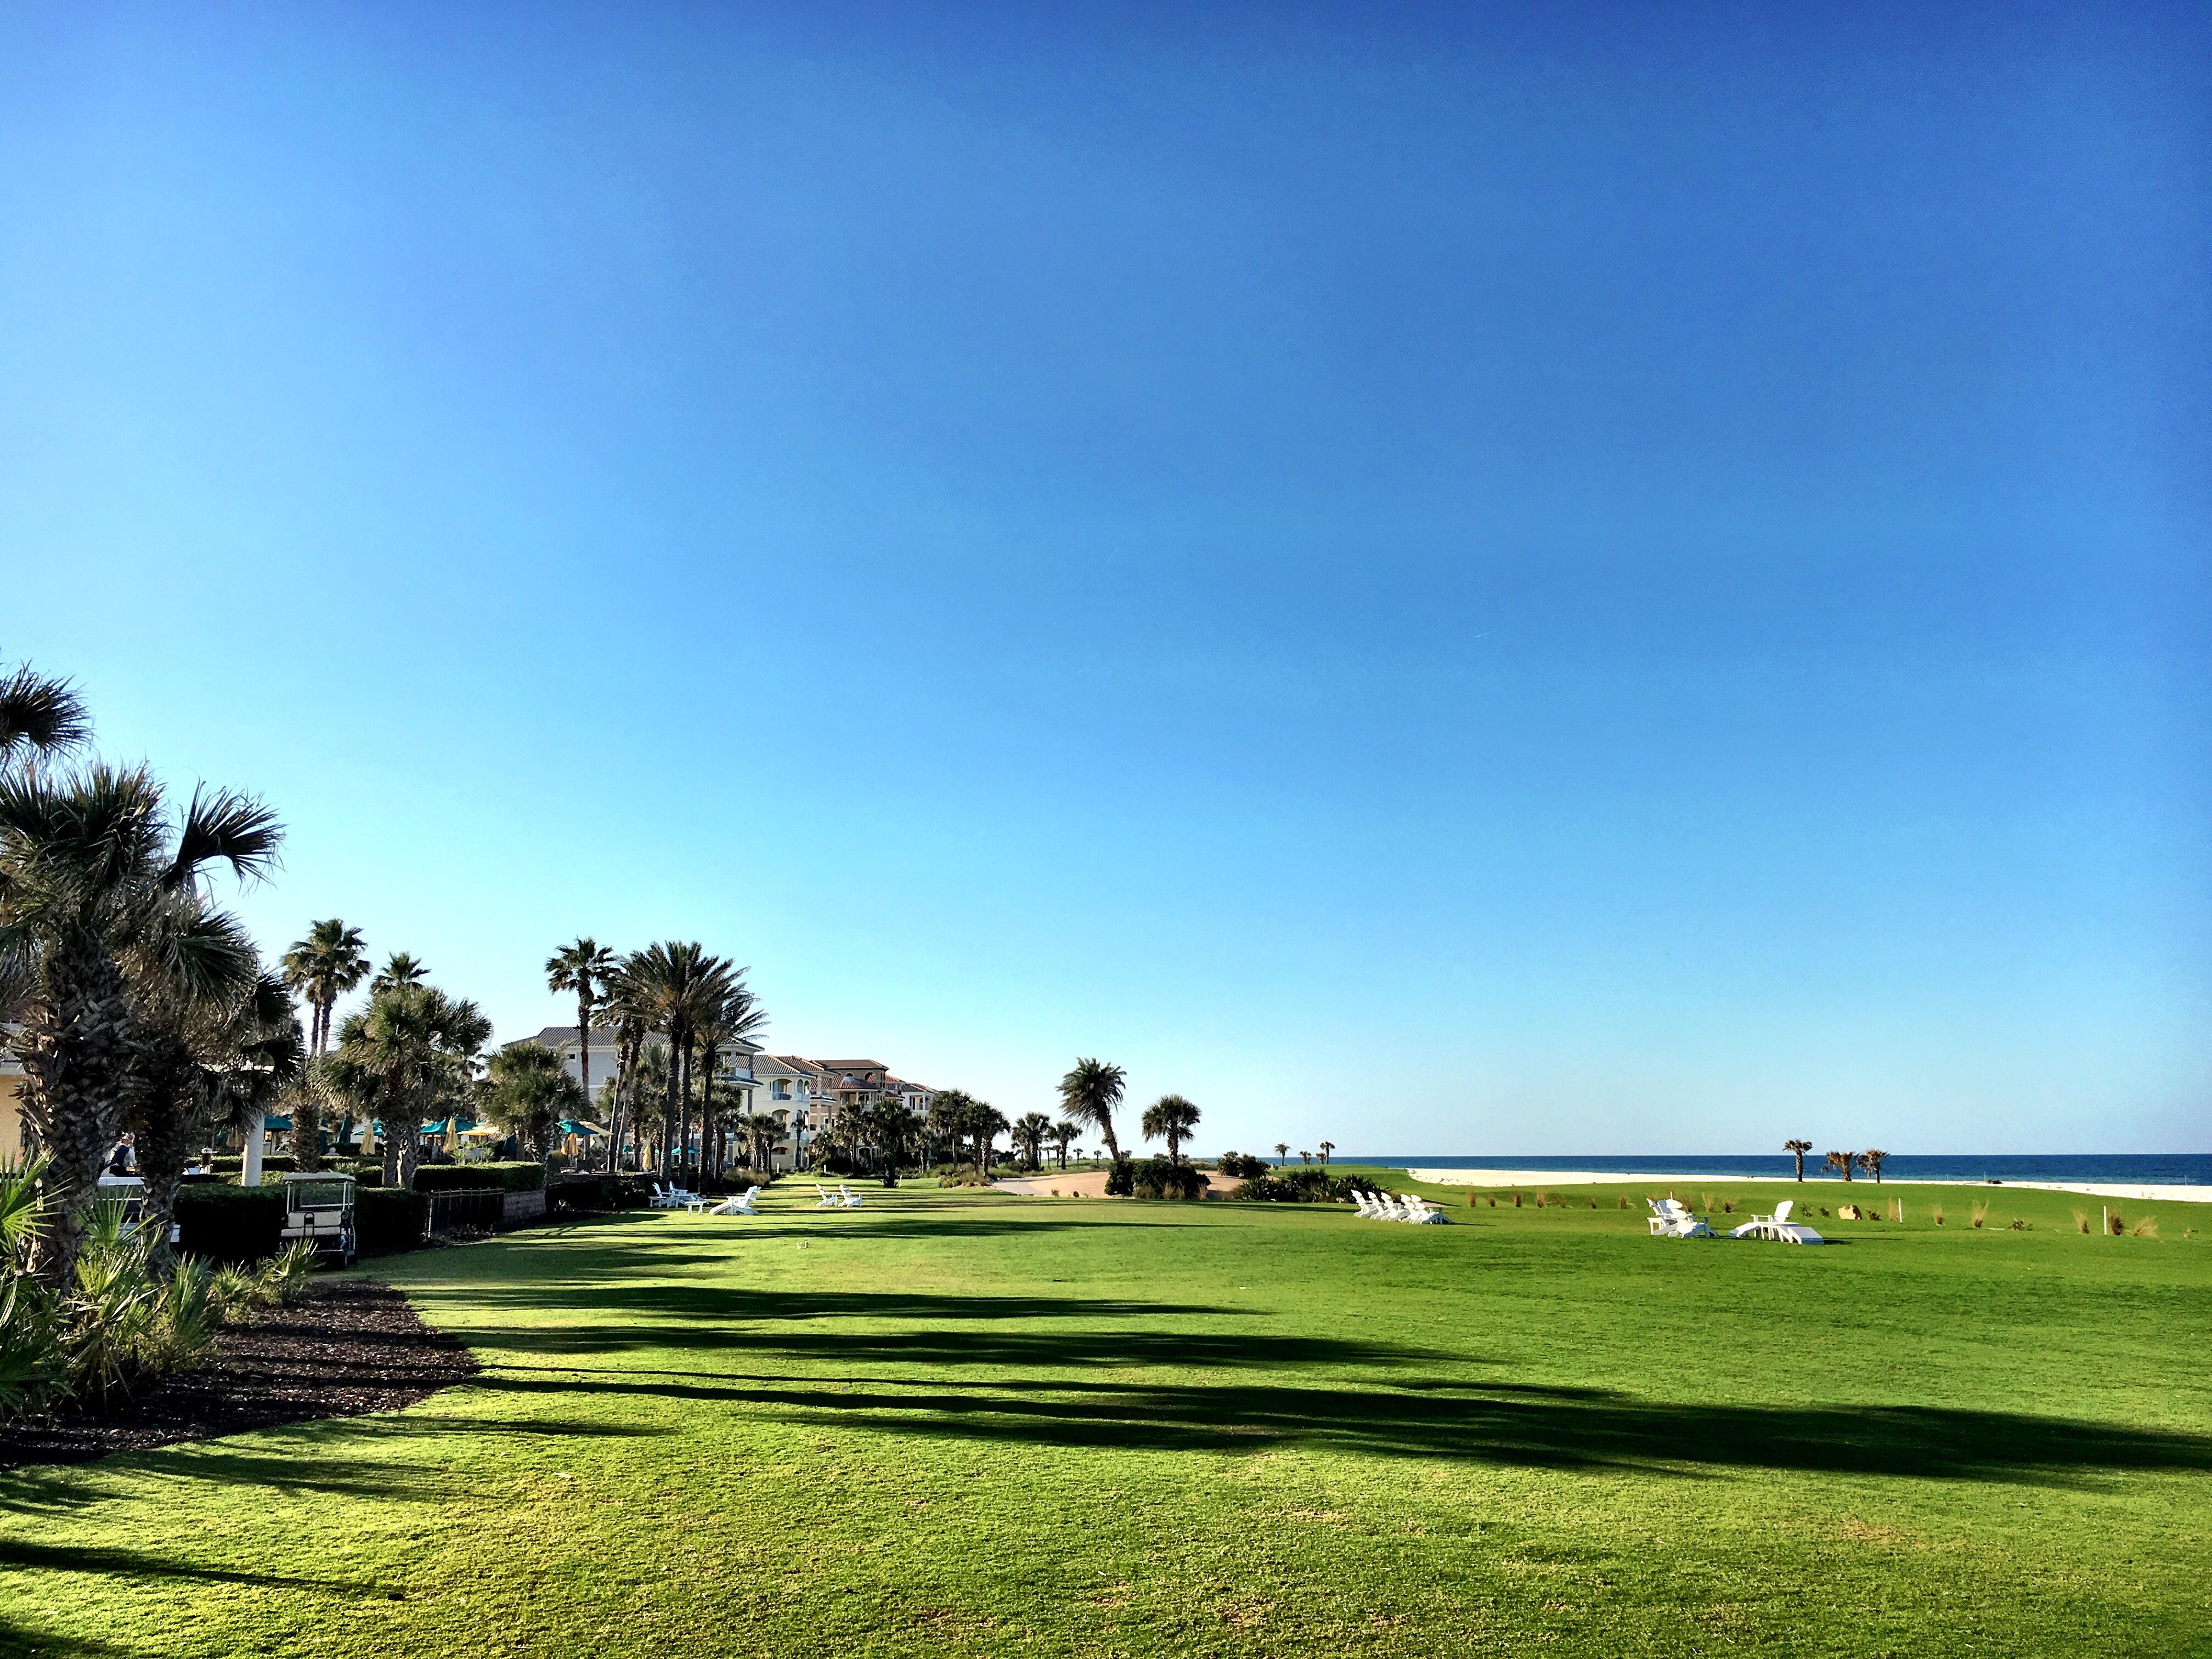 Hammock Beach Resort Lawn